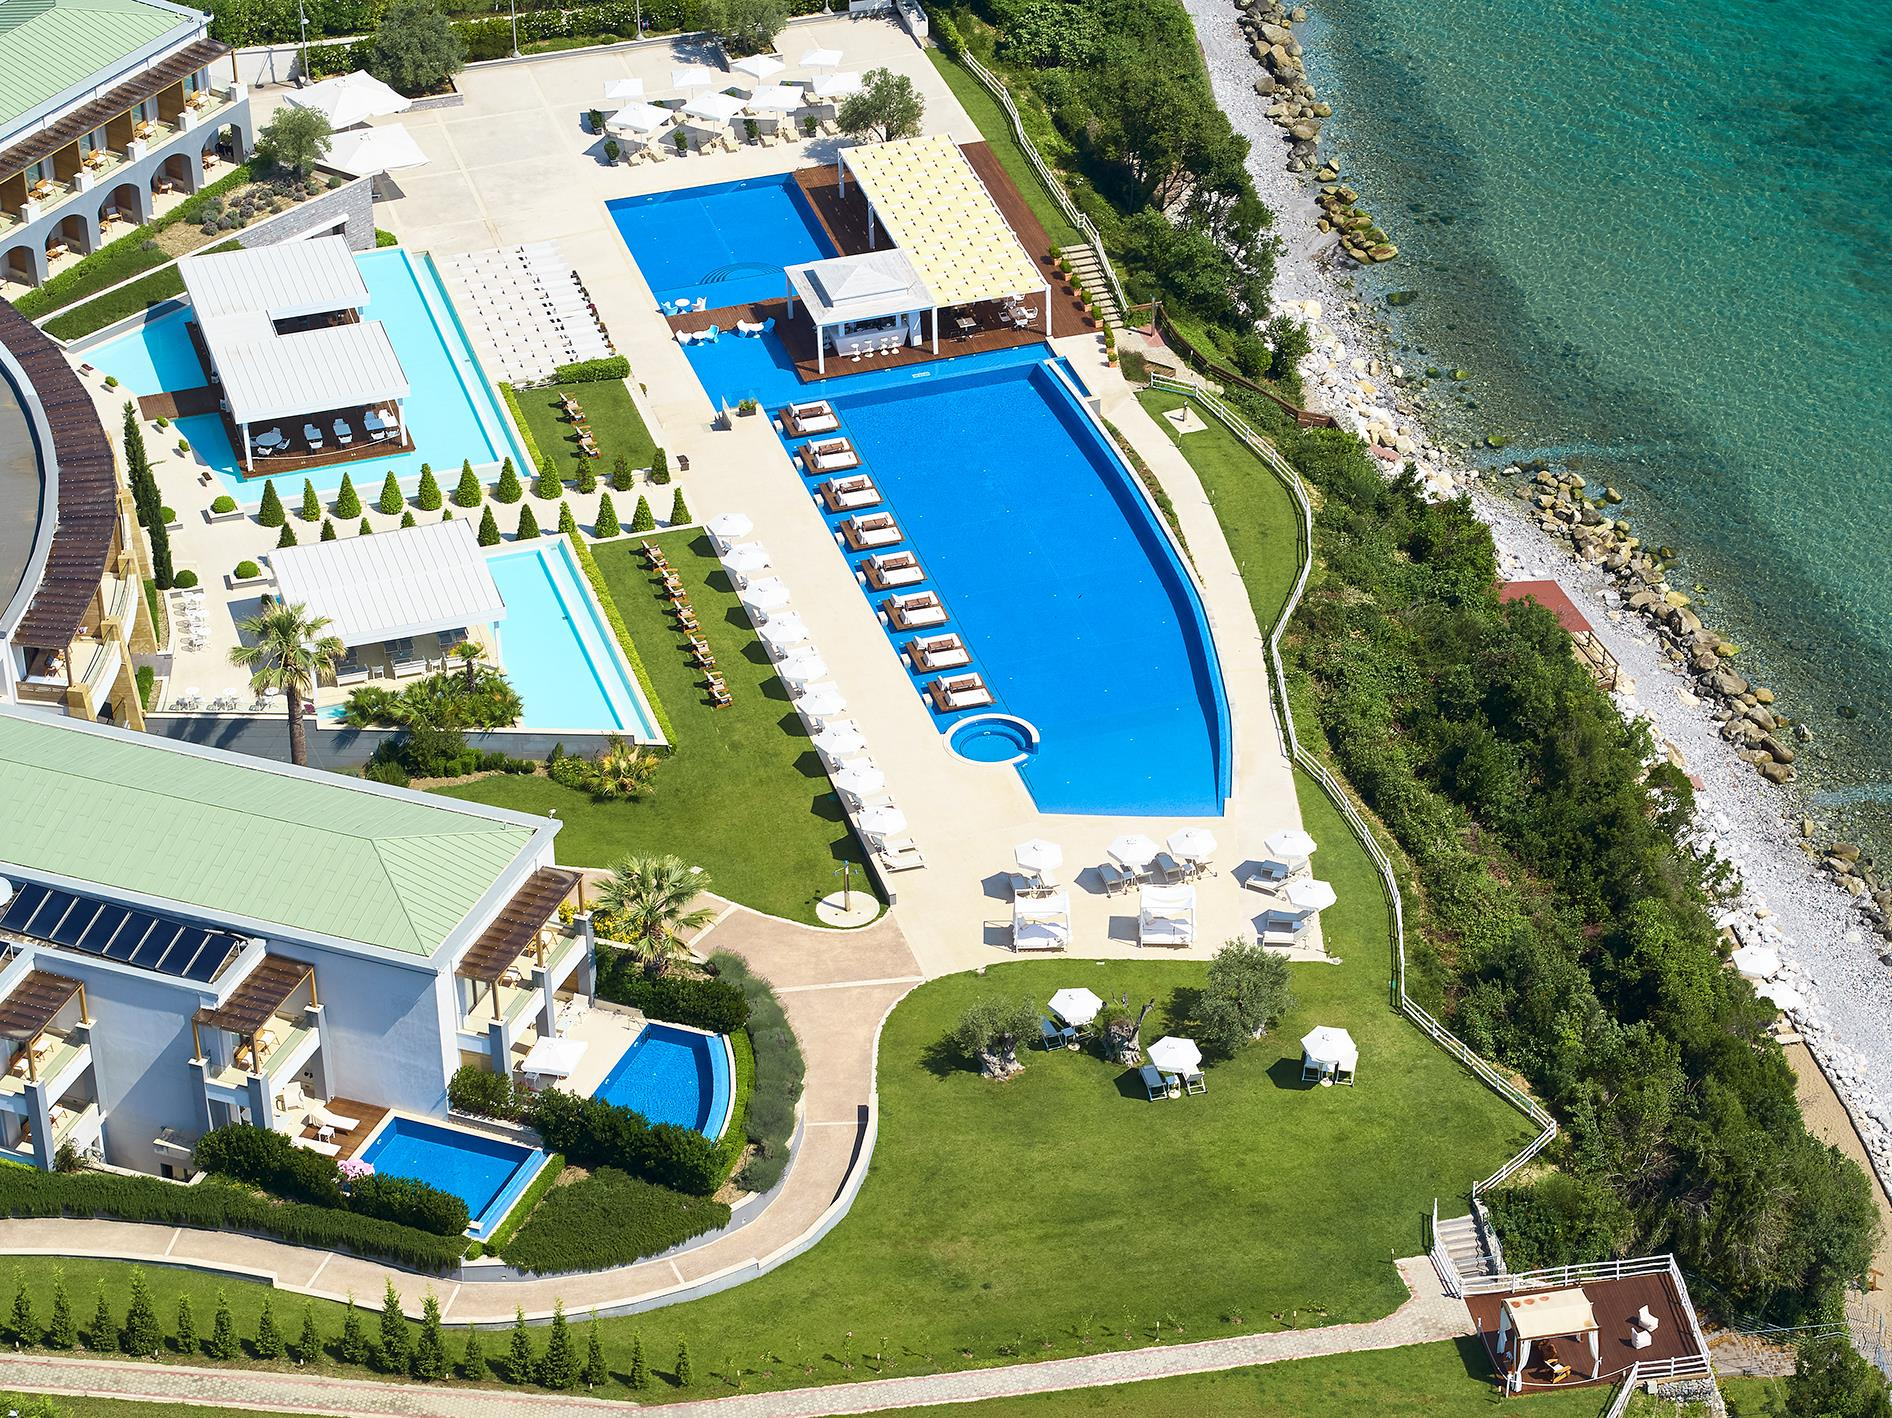 cavo-olympo-luxury-hotel-spa-genel-005